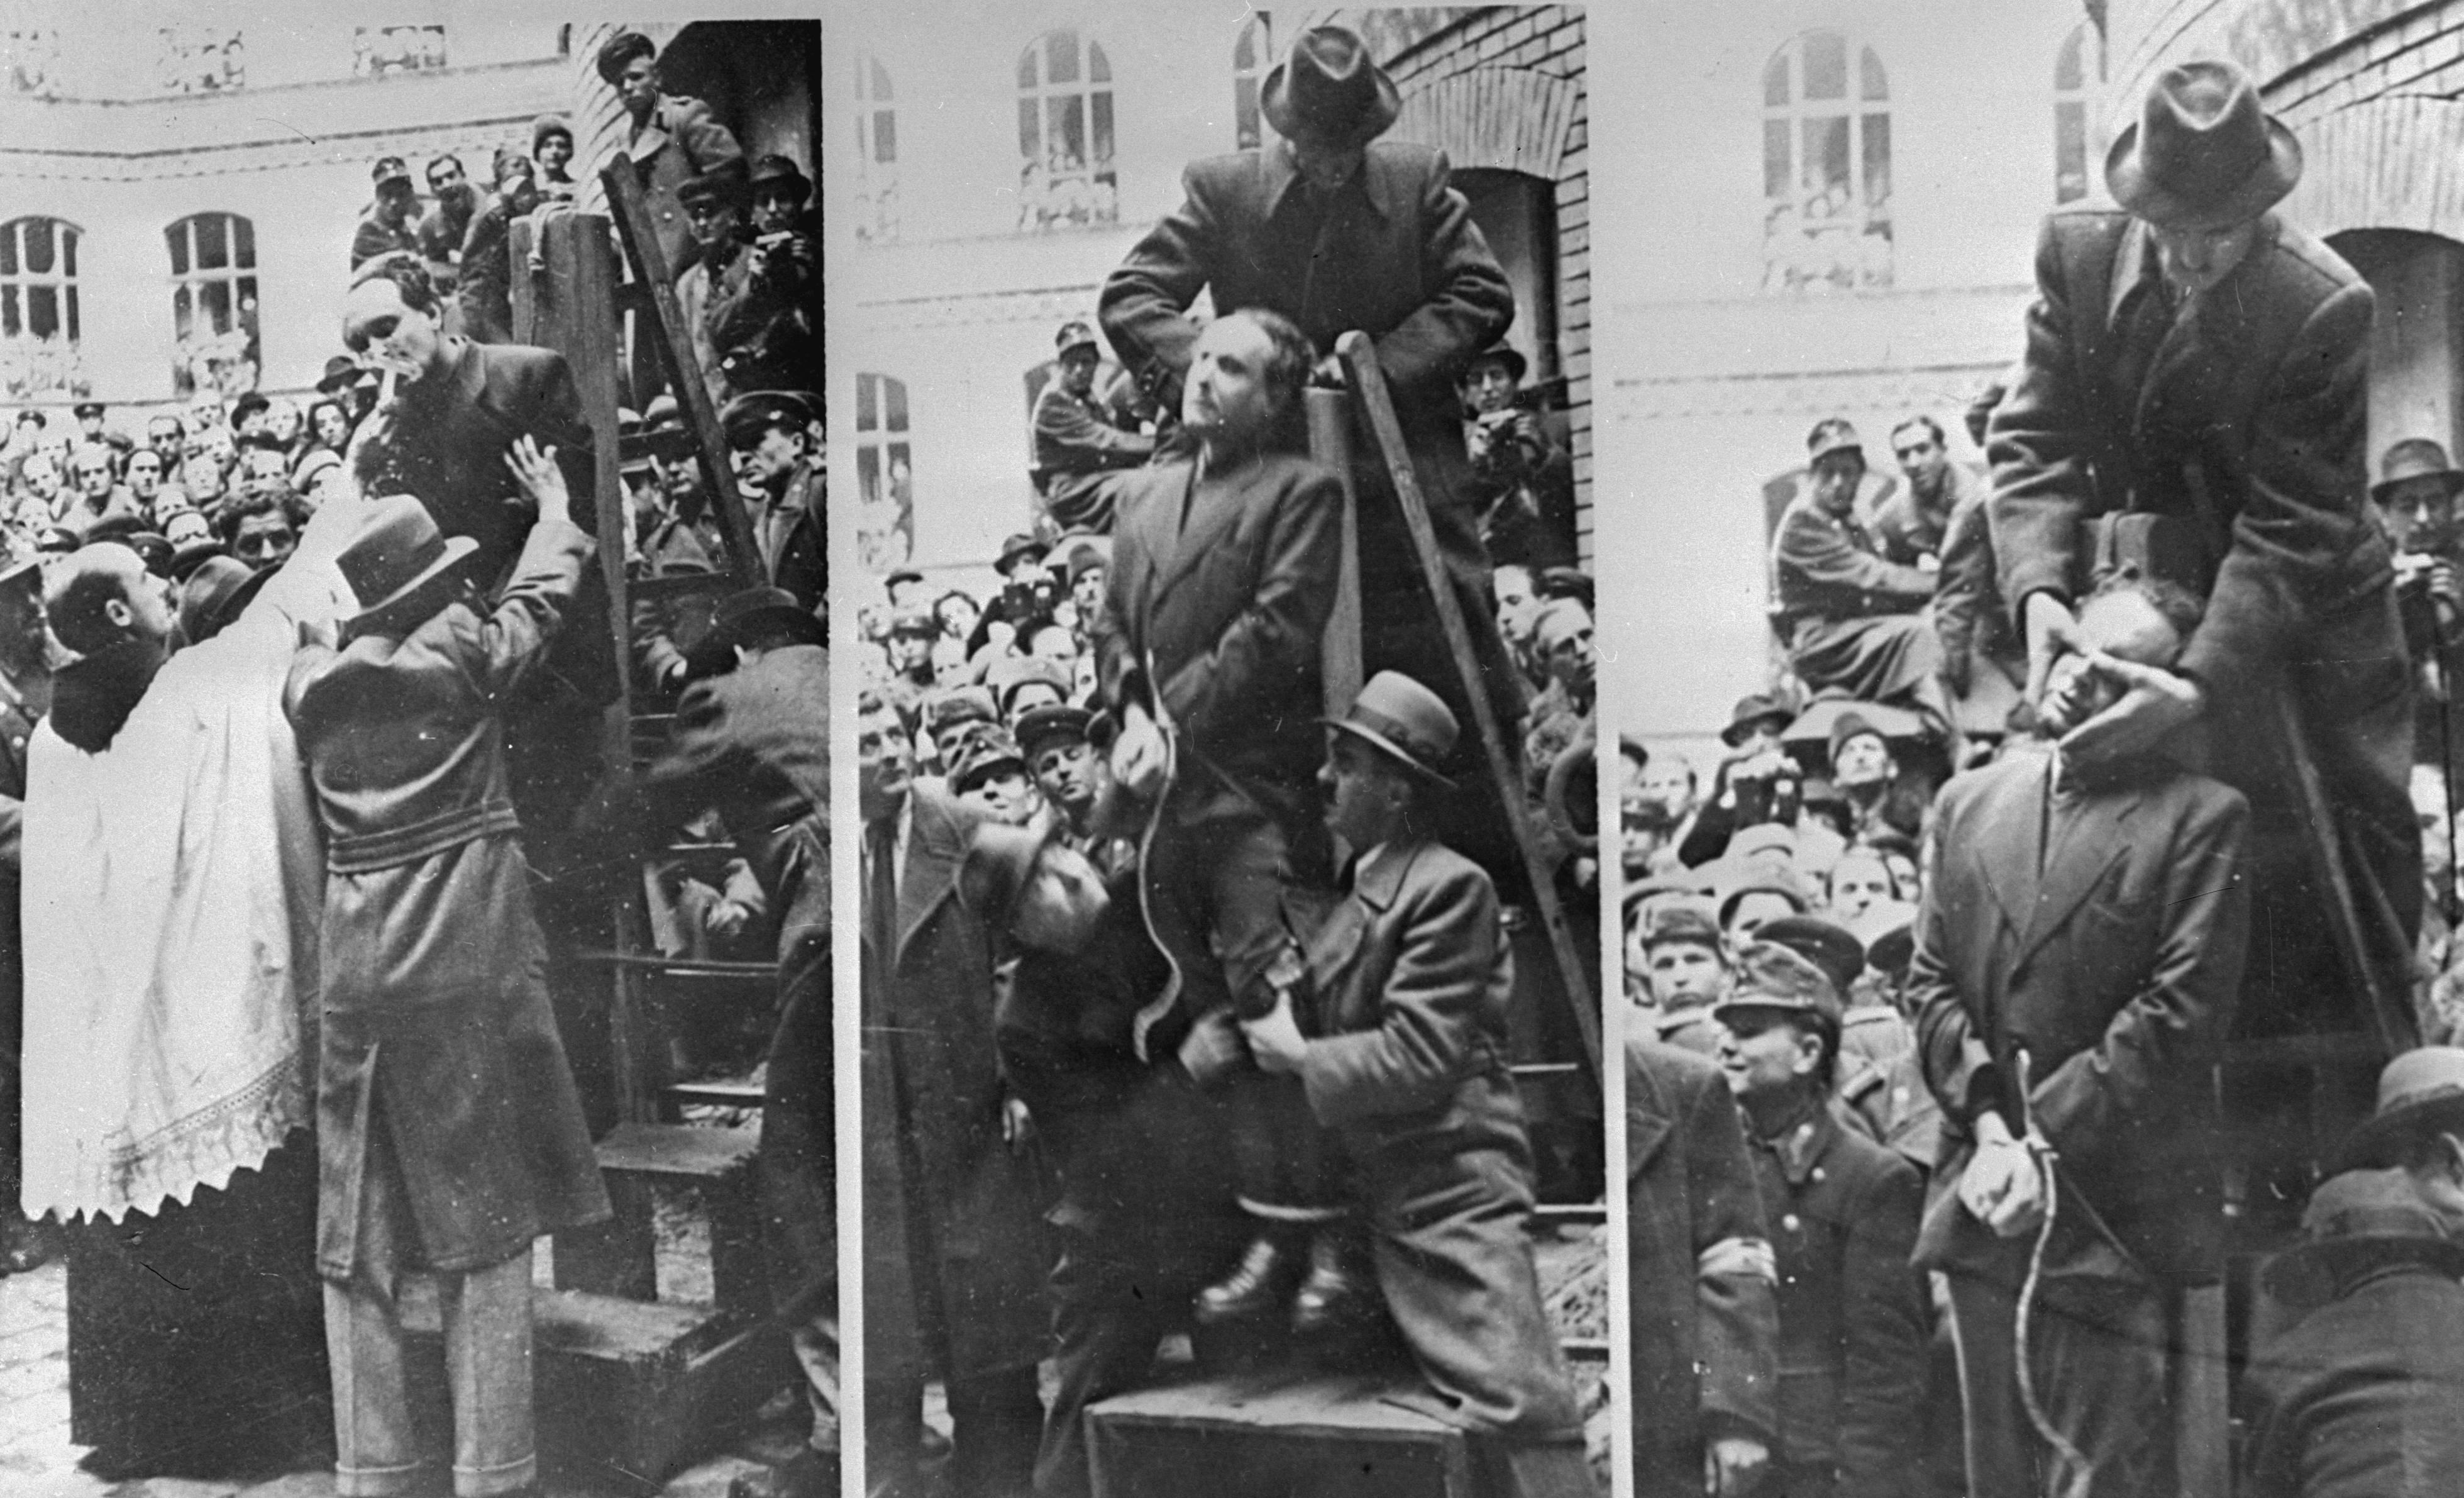 1946_marcius_12_szalsi_ferenc_nyilas_nepvezeto_kivegzese.jpg